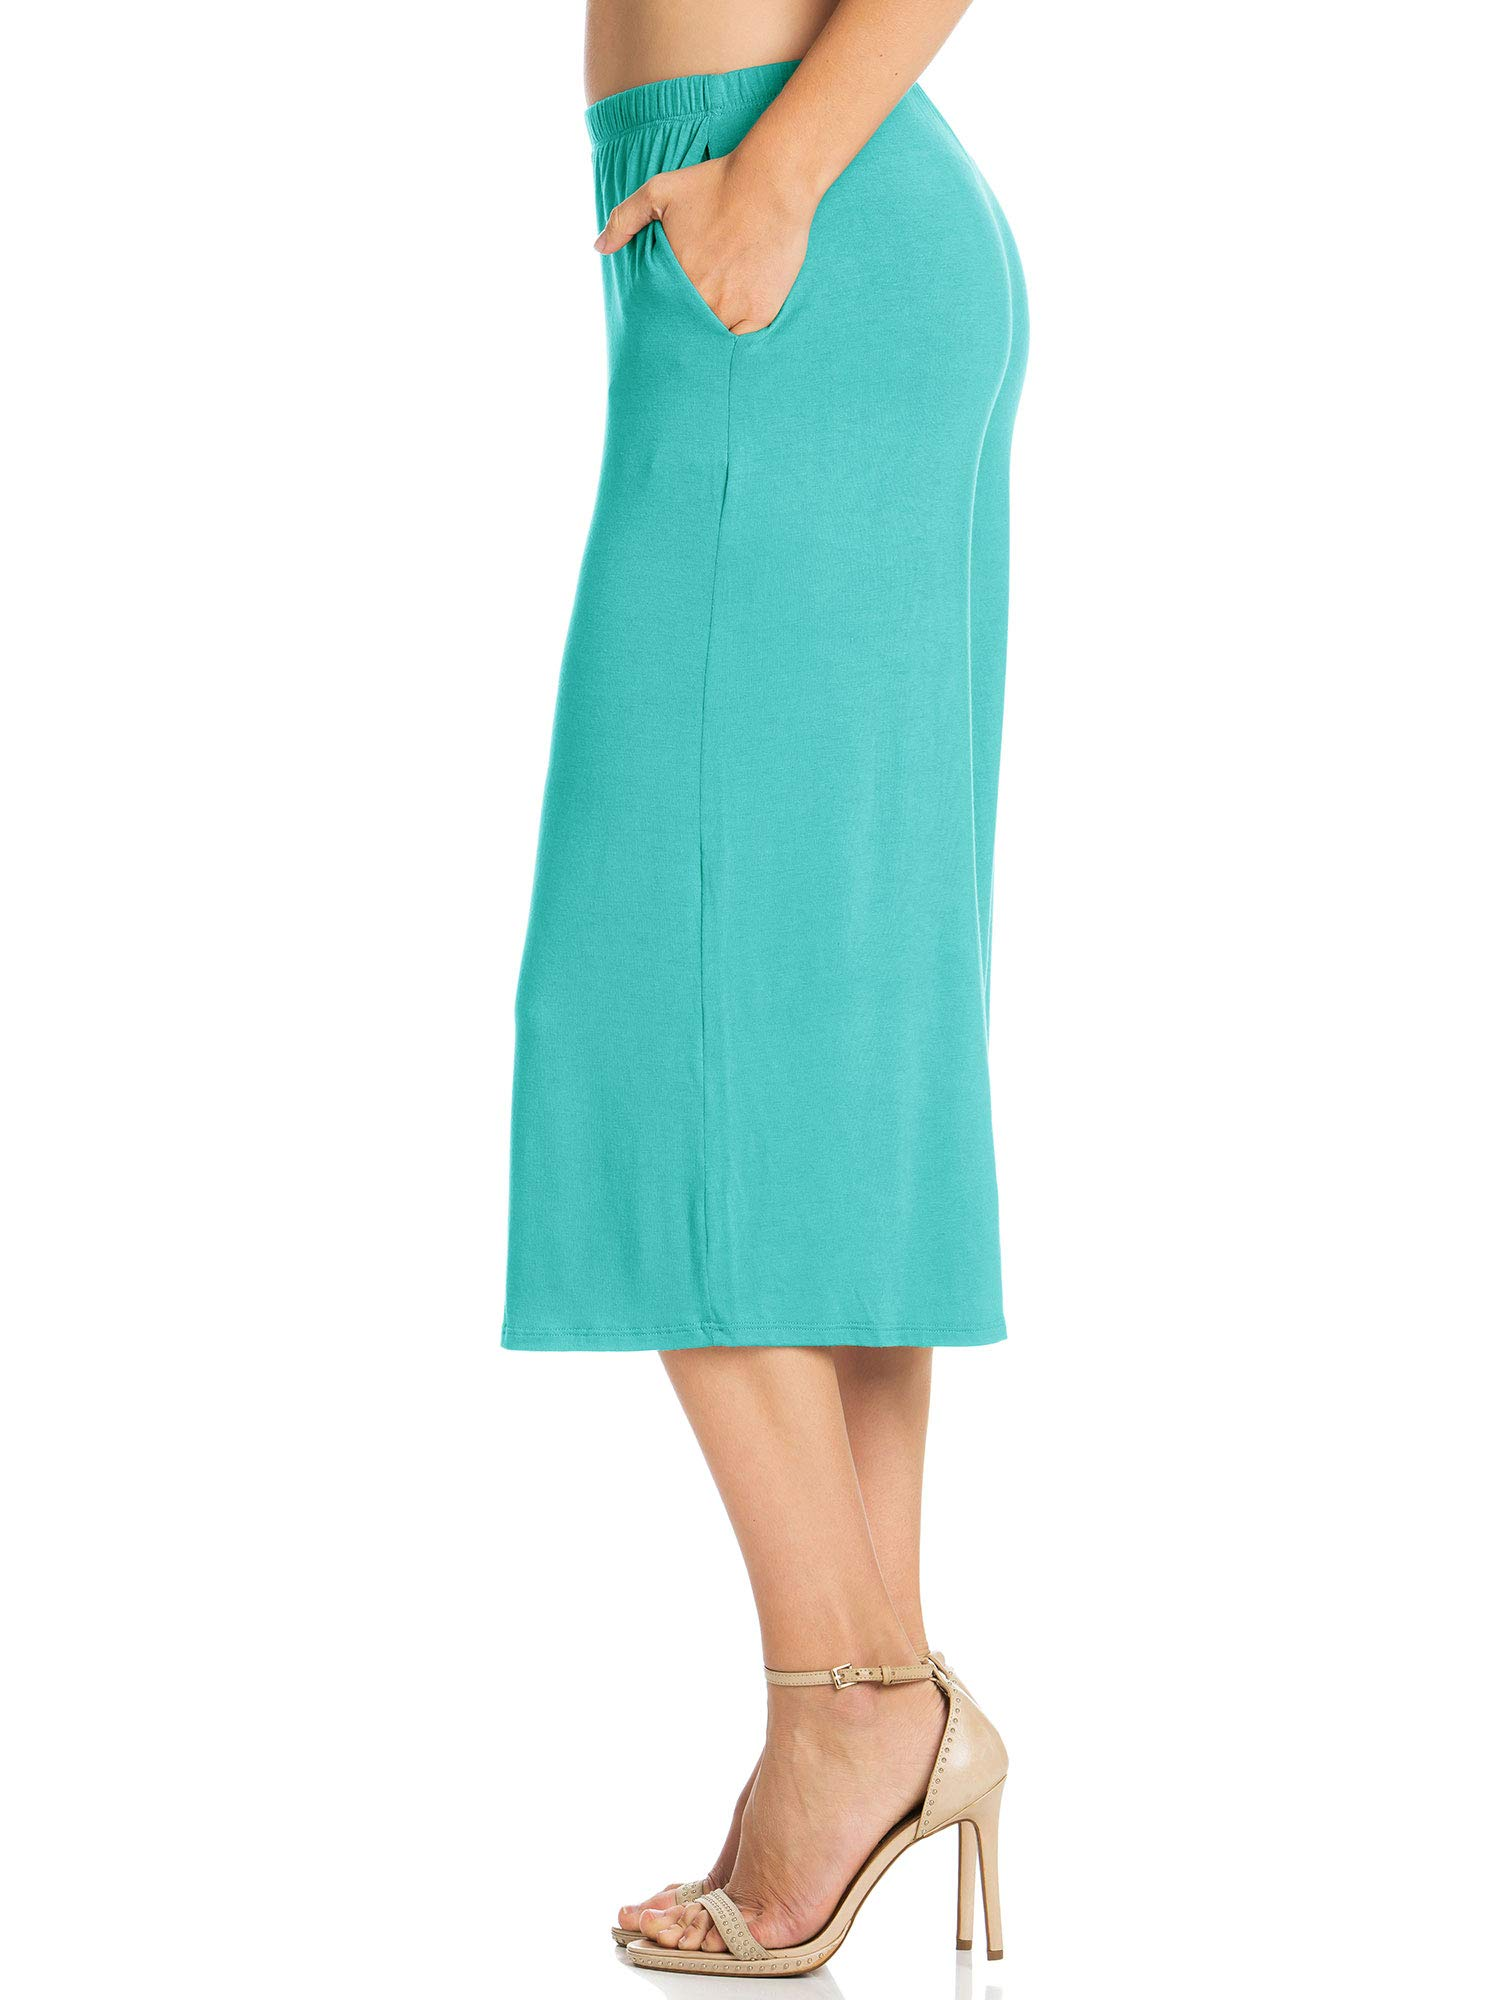 Fashion California Womens 1 Pack Elastic Waist Jersey Culottes Capri Pocket Pants (XXXXX-Large, Aqua) by Fashion California (Image #4)